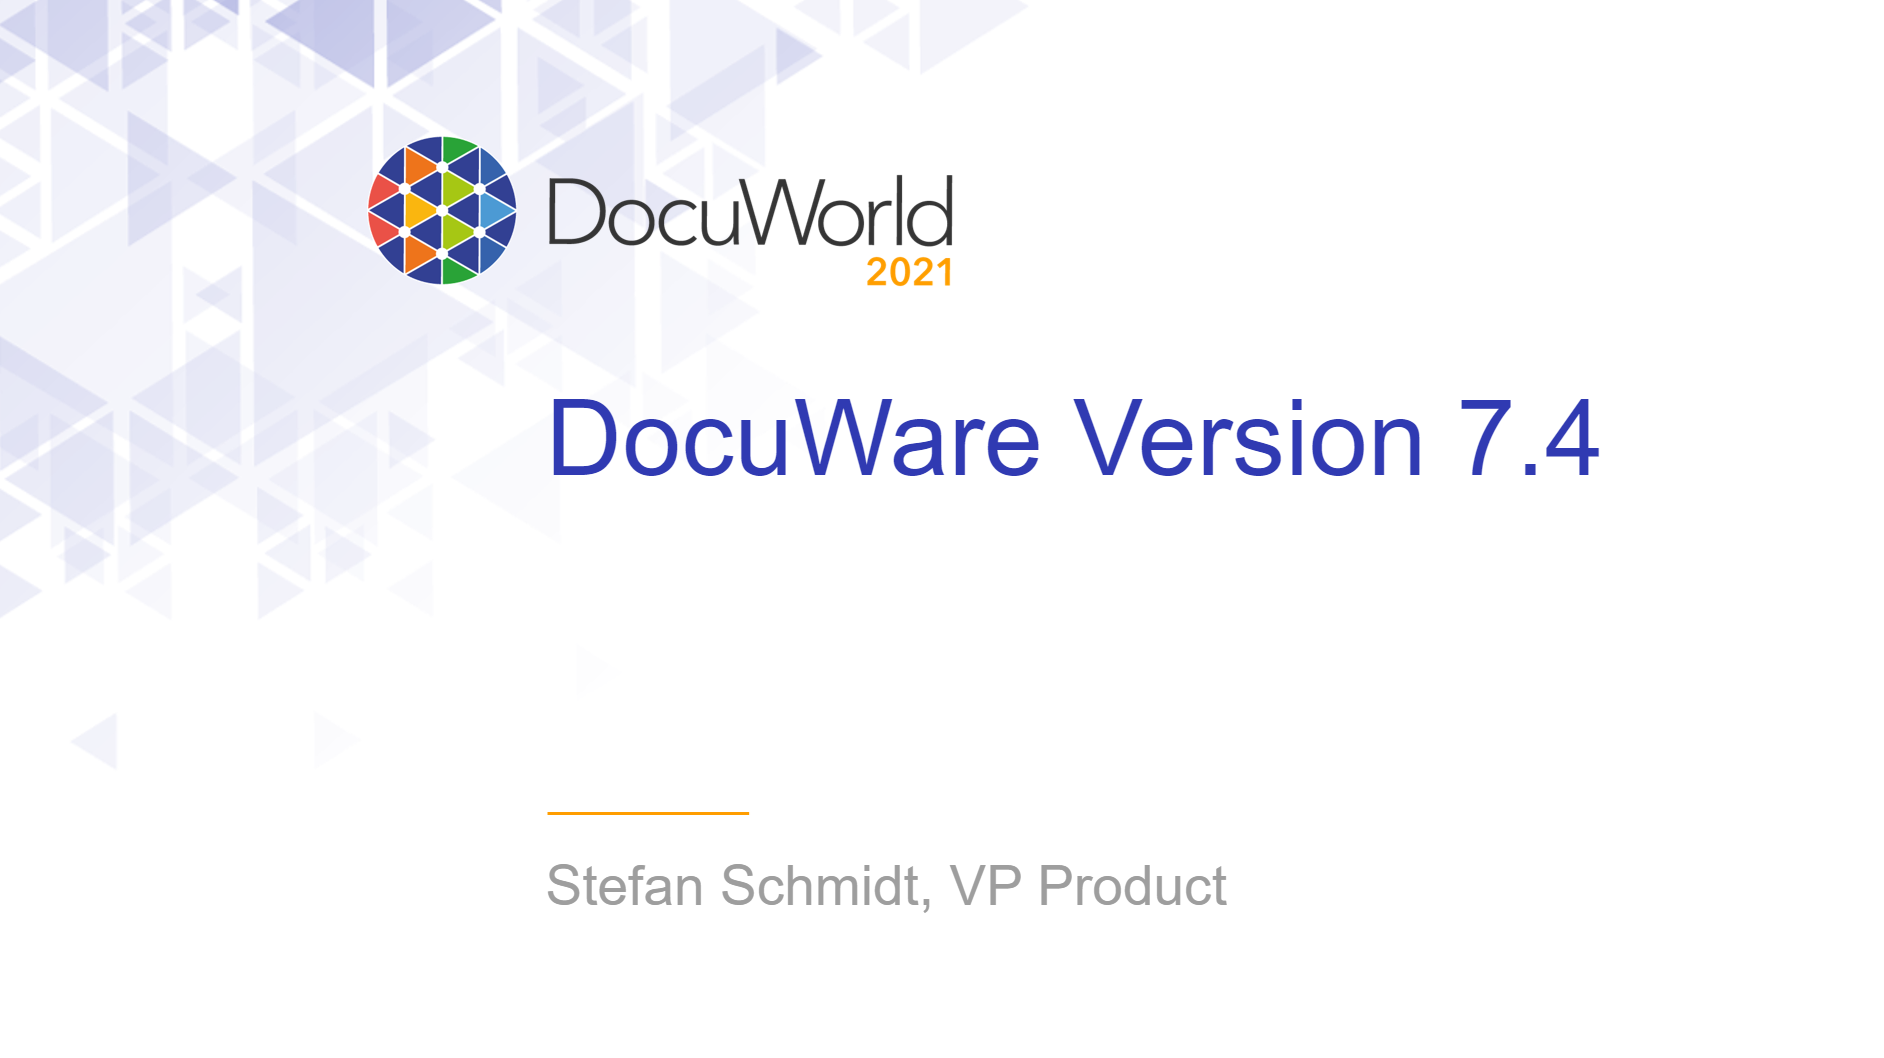 DocuWorld User Conference 2021: DocuWare Version 7.4